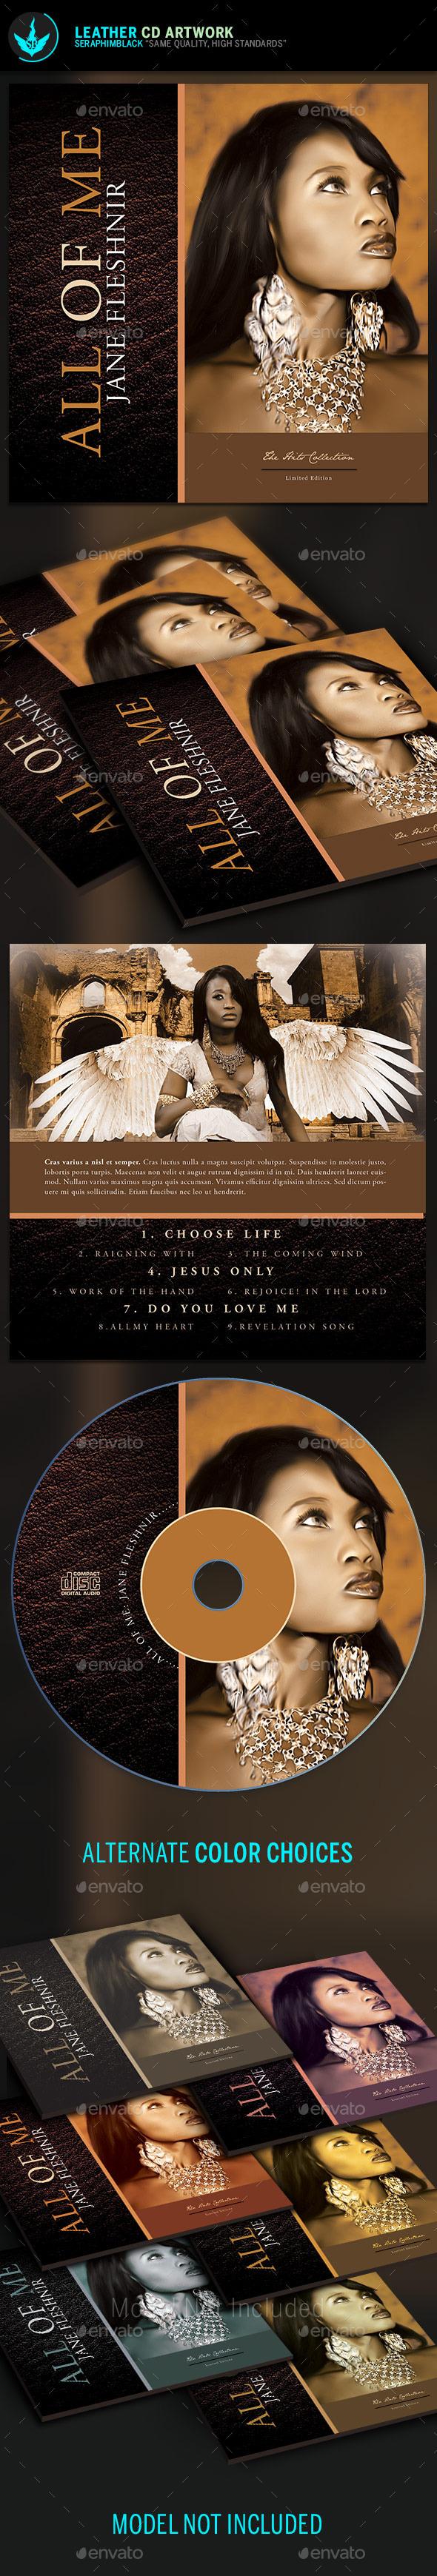 Leather CD Artwork Template - CD & DVD Artwork Print Templates